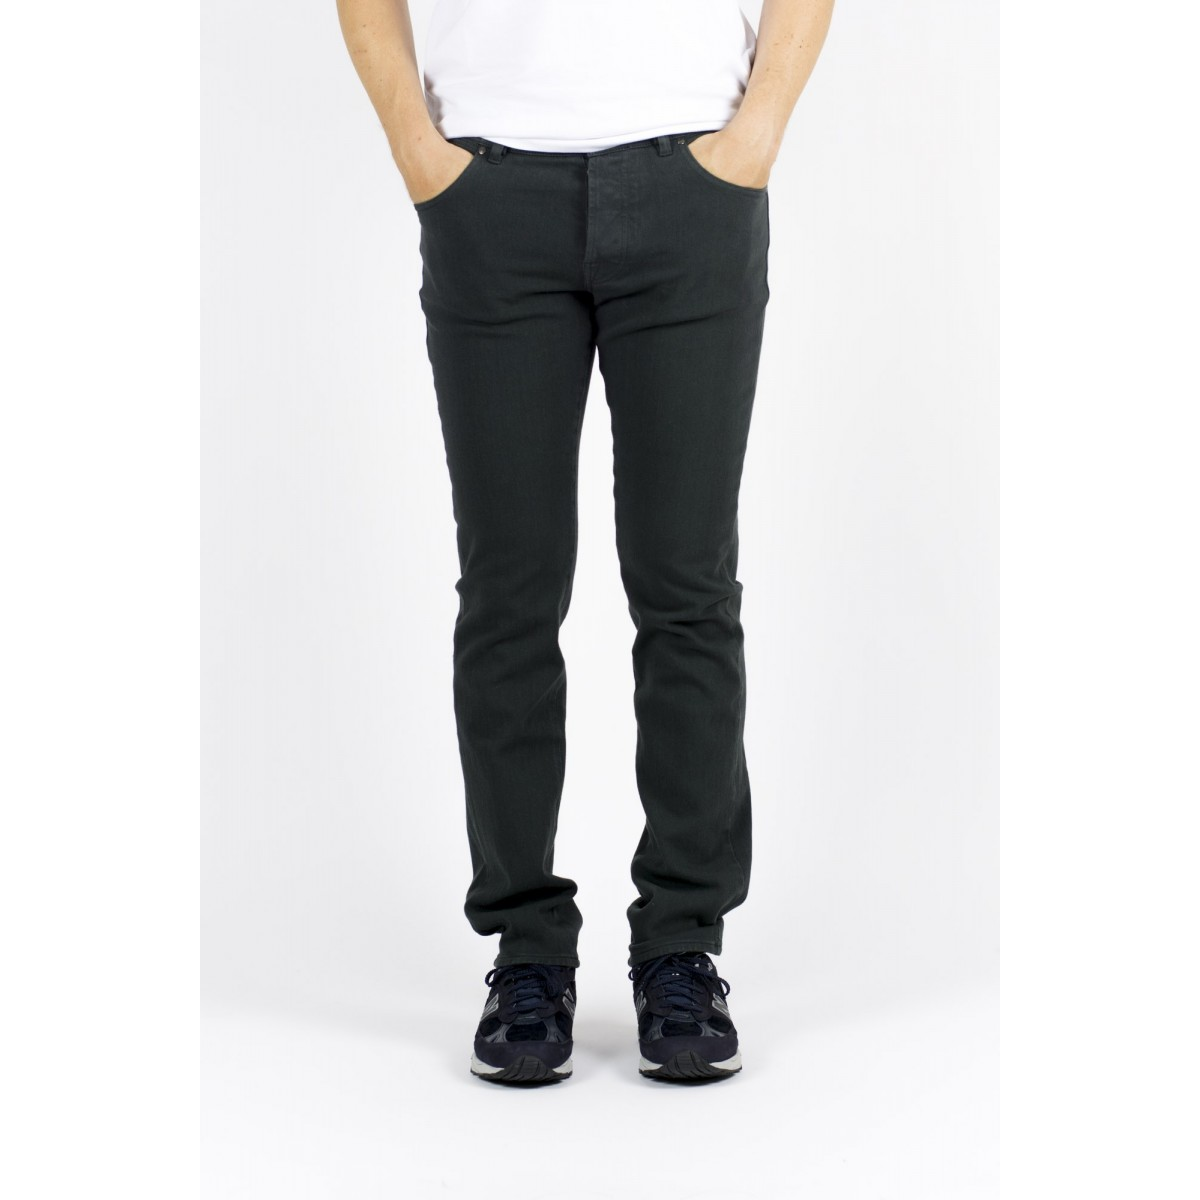 Pantalone Uomo Thinple - Six 46 Twill Sovratinto Bielastico 818 . piombo